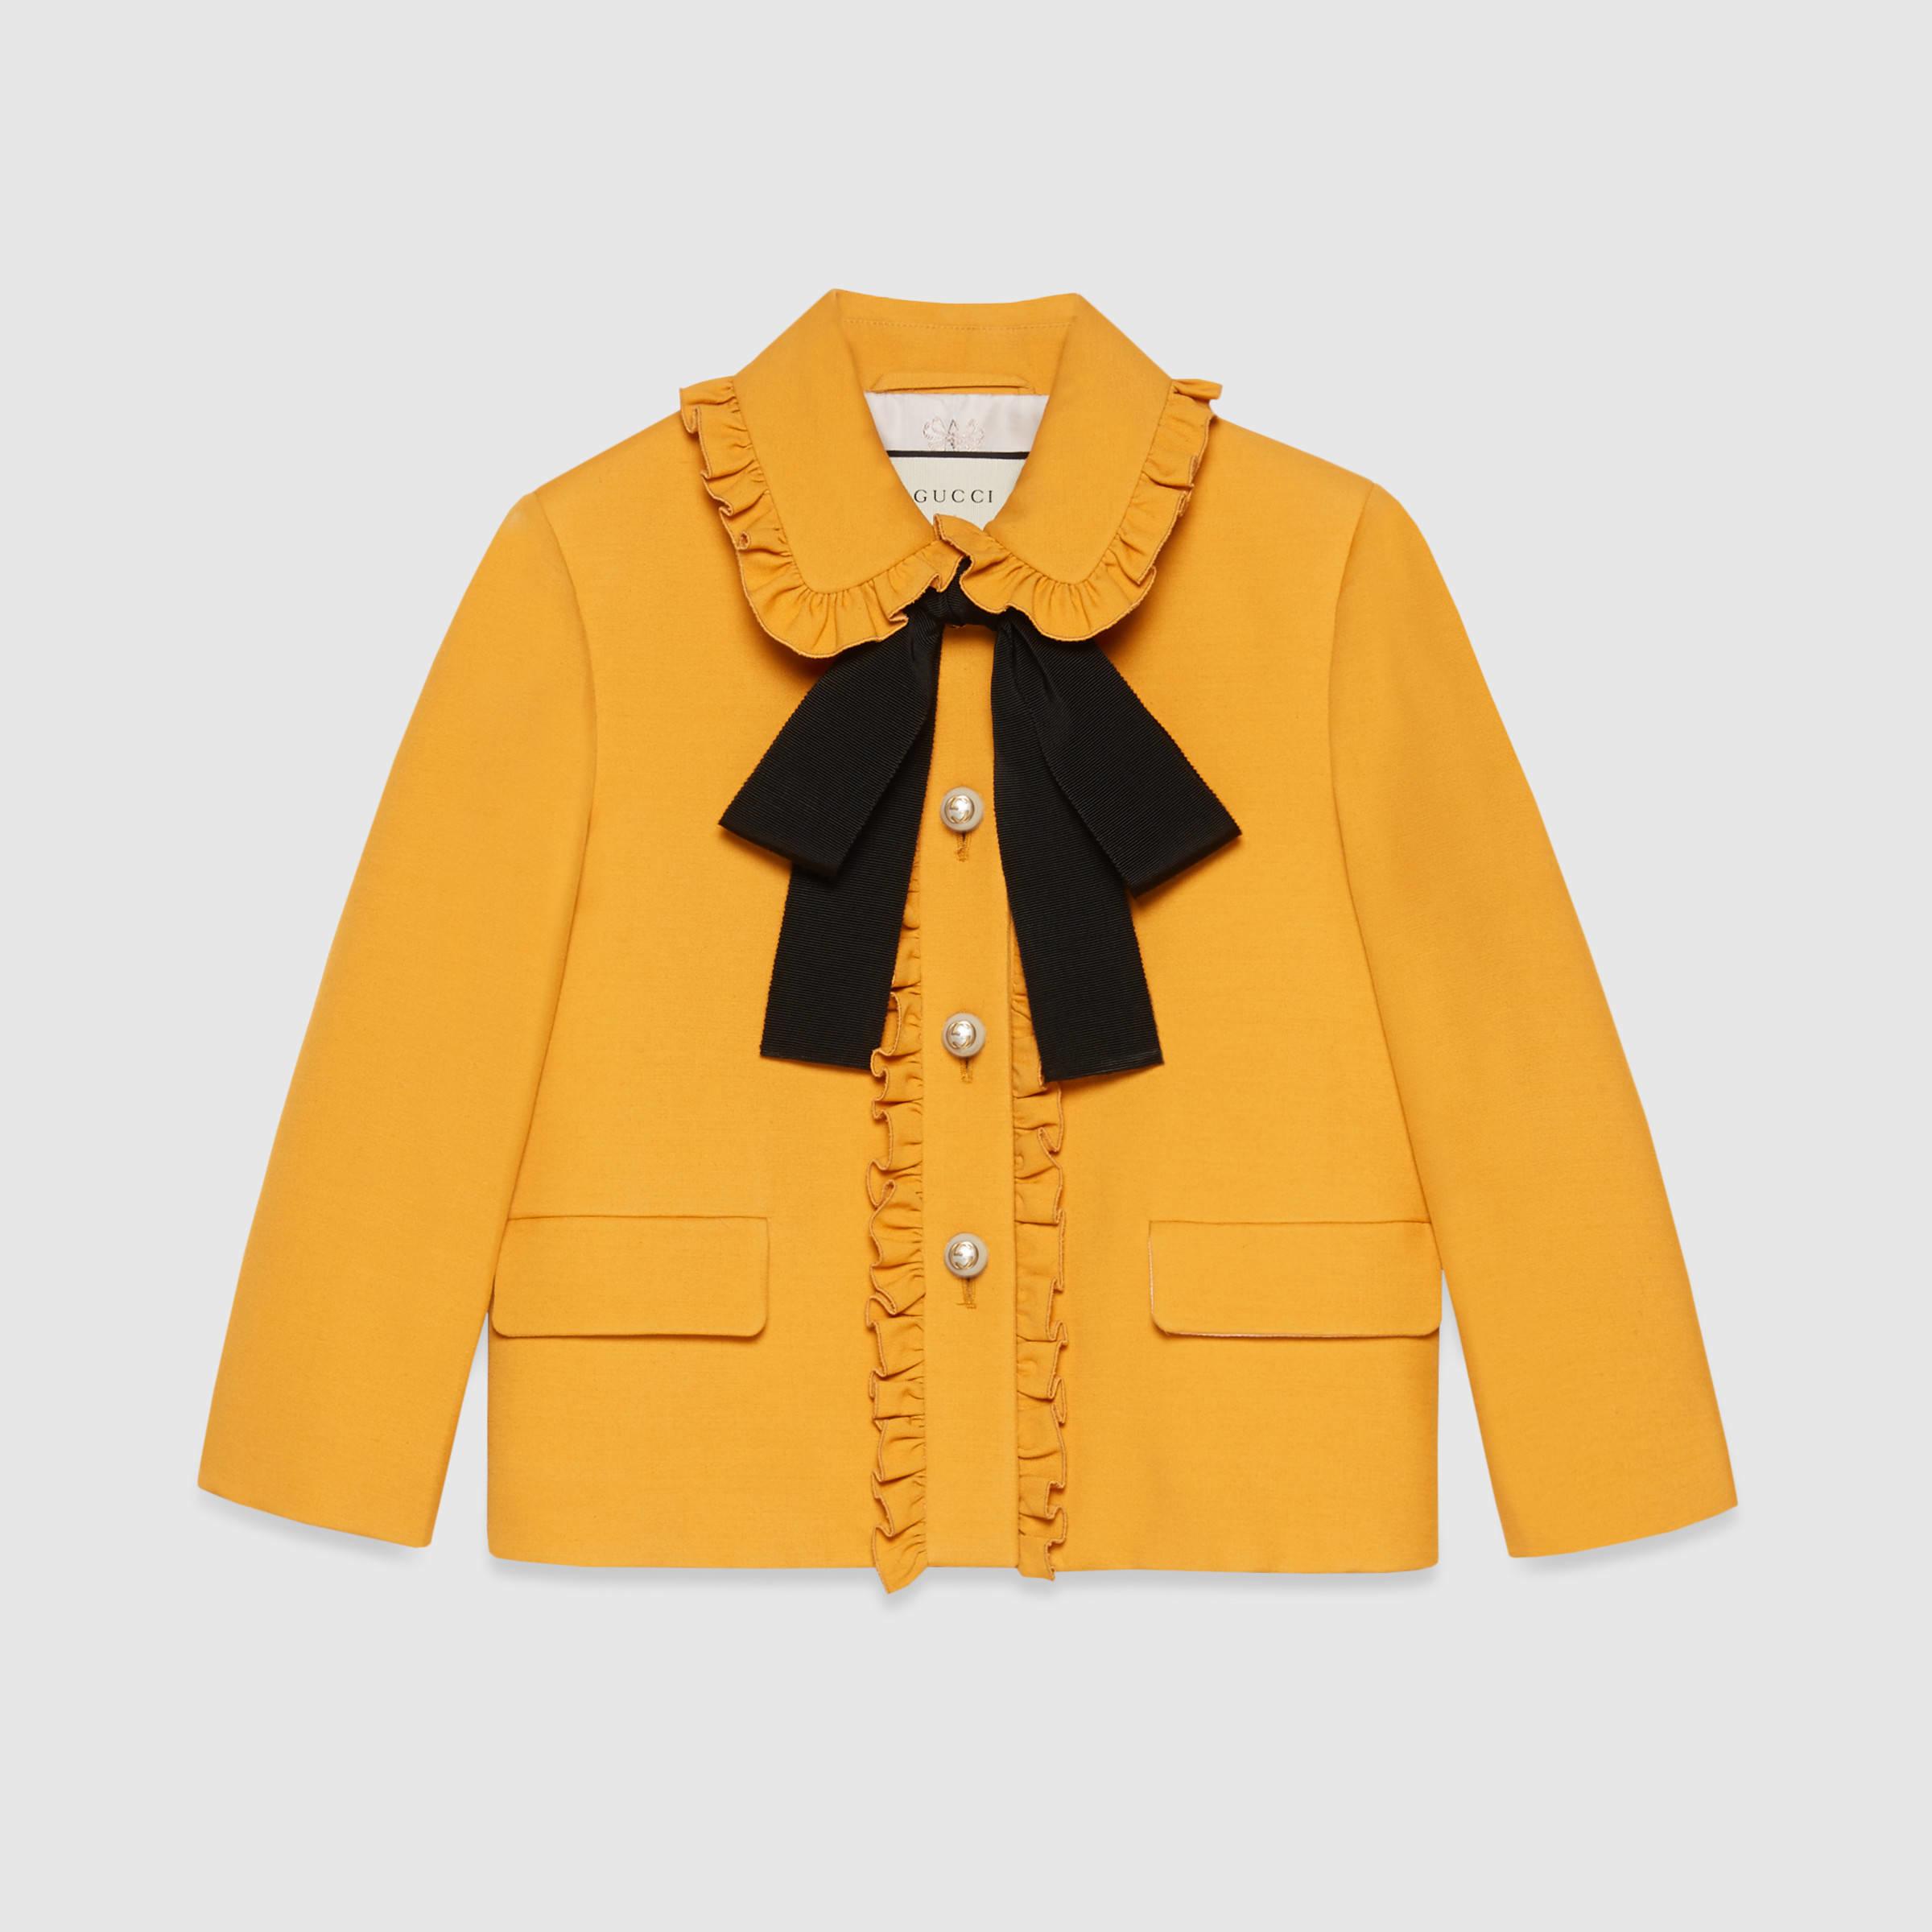 90118e064 Gucci Silk-wool Jacket in Yellow - Lyst